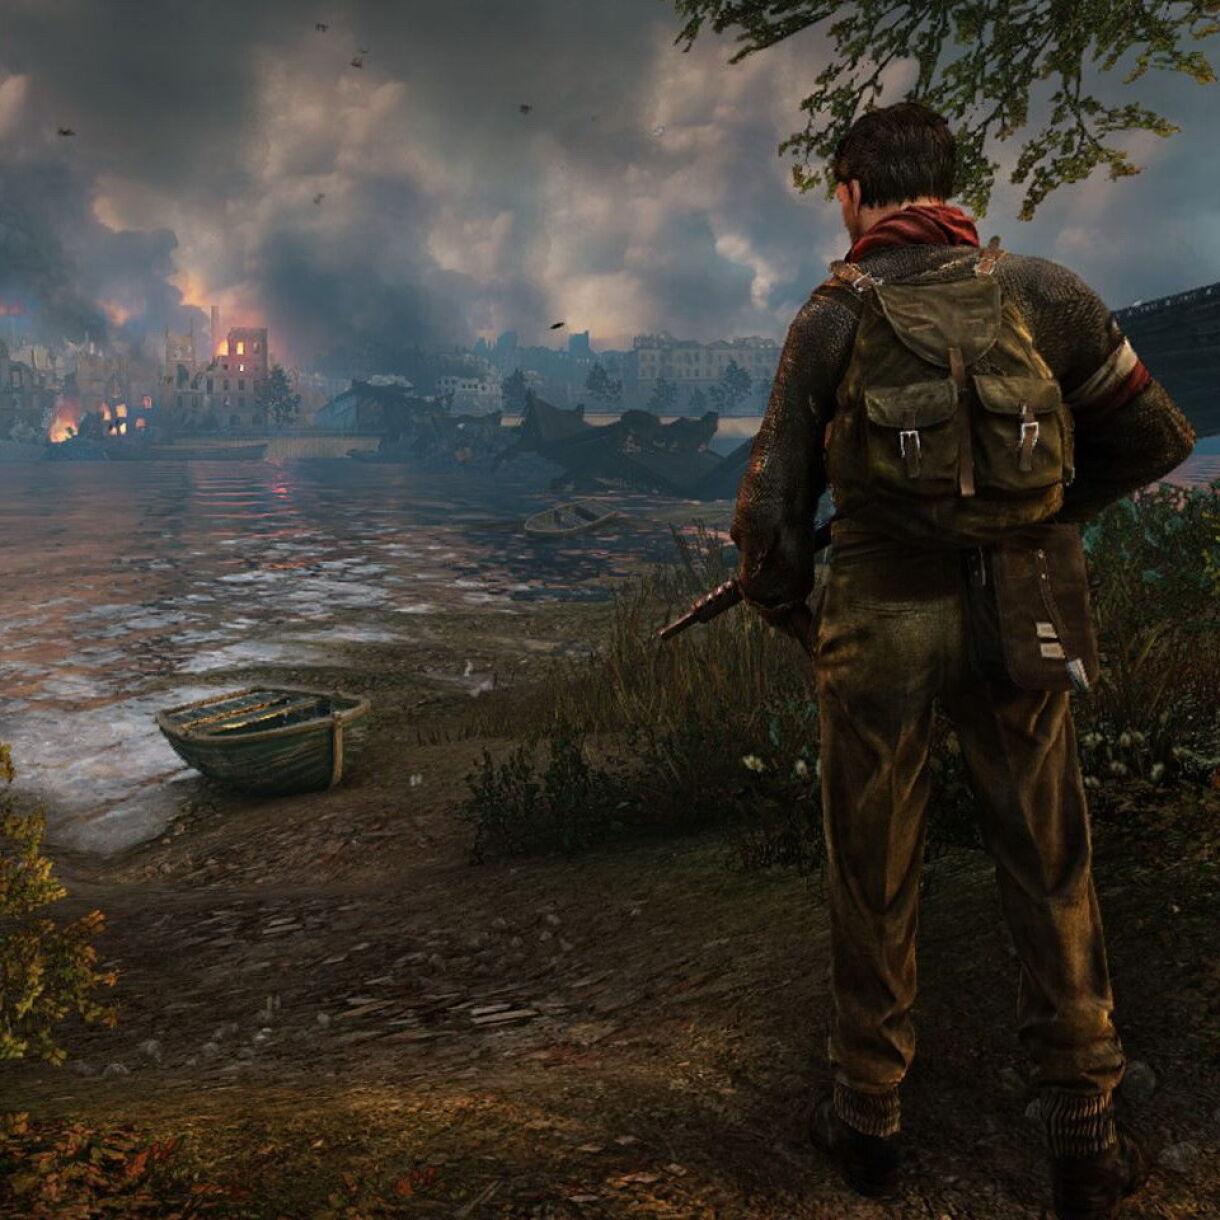 Crytek opened a VR laboratory in Turkey